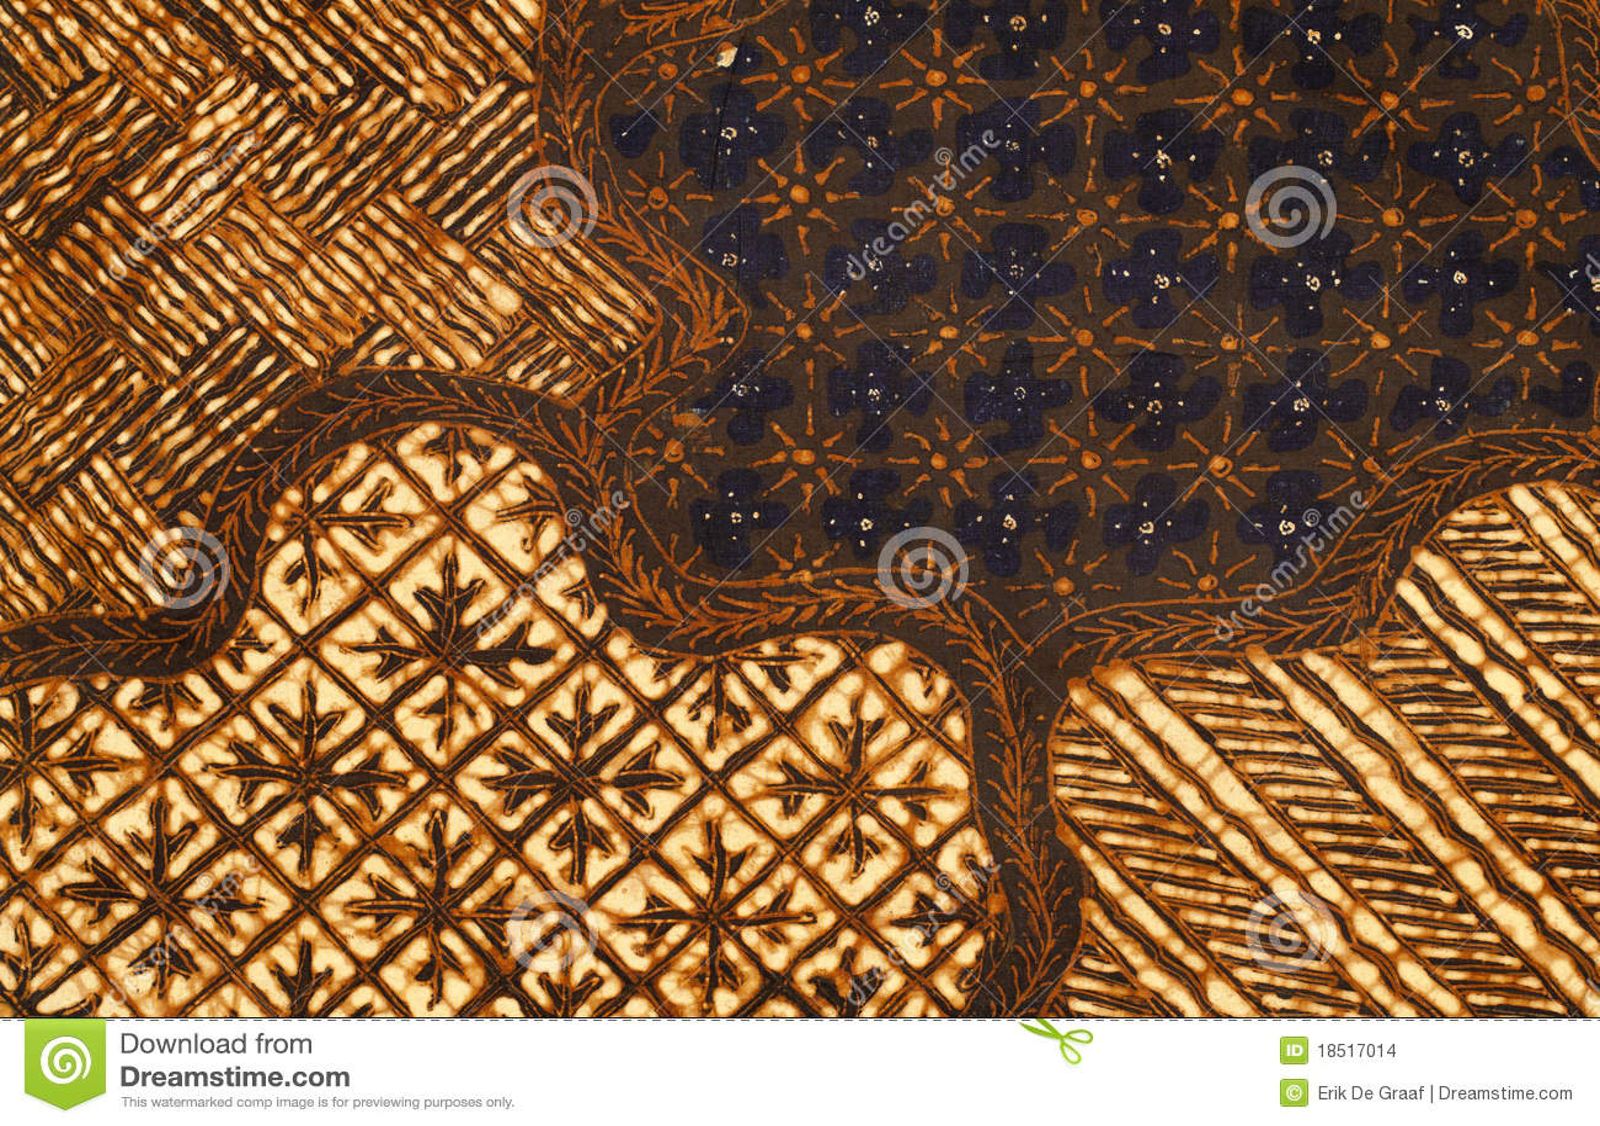 Batik design royalty free stock photos image 29546988 - Batik Design Stock Images Image 18517014